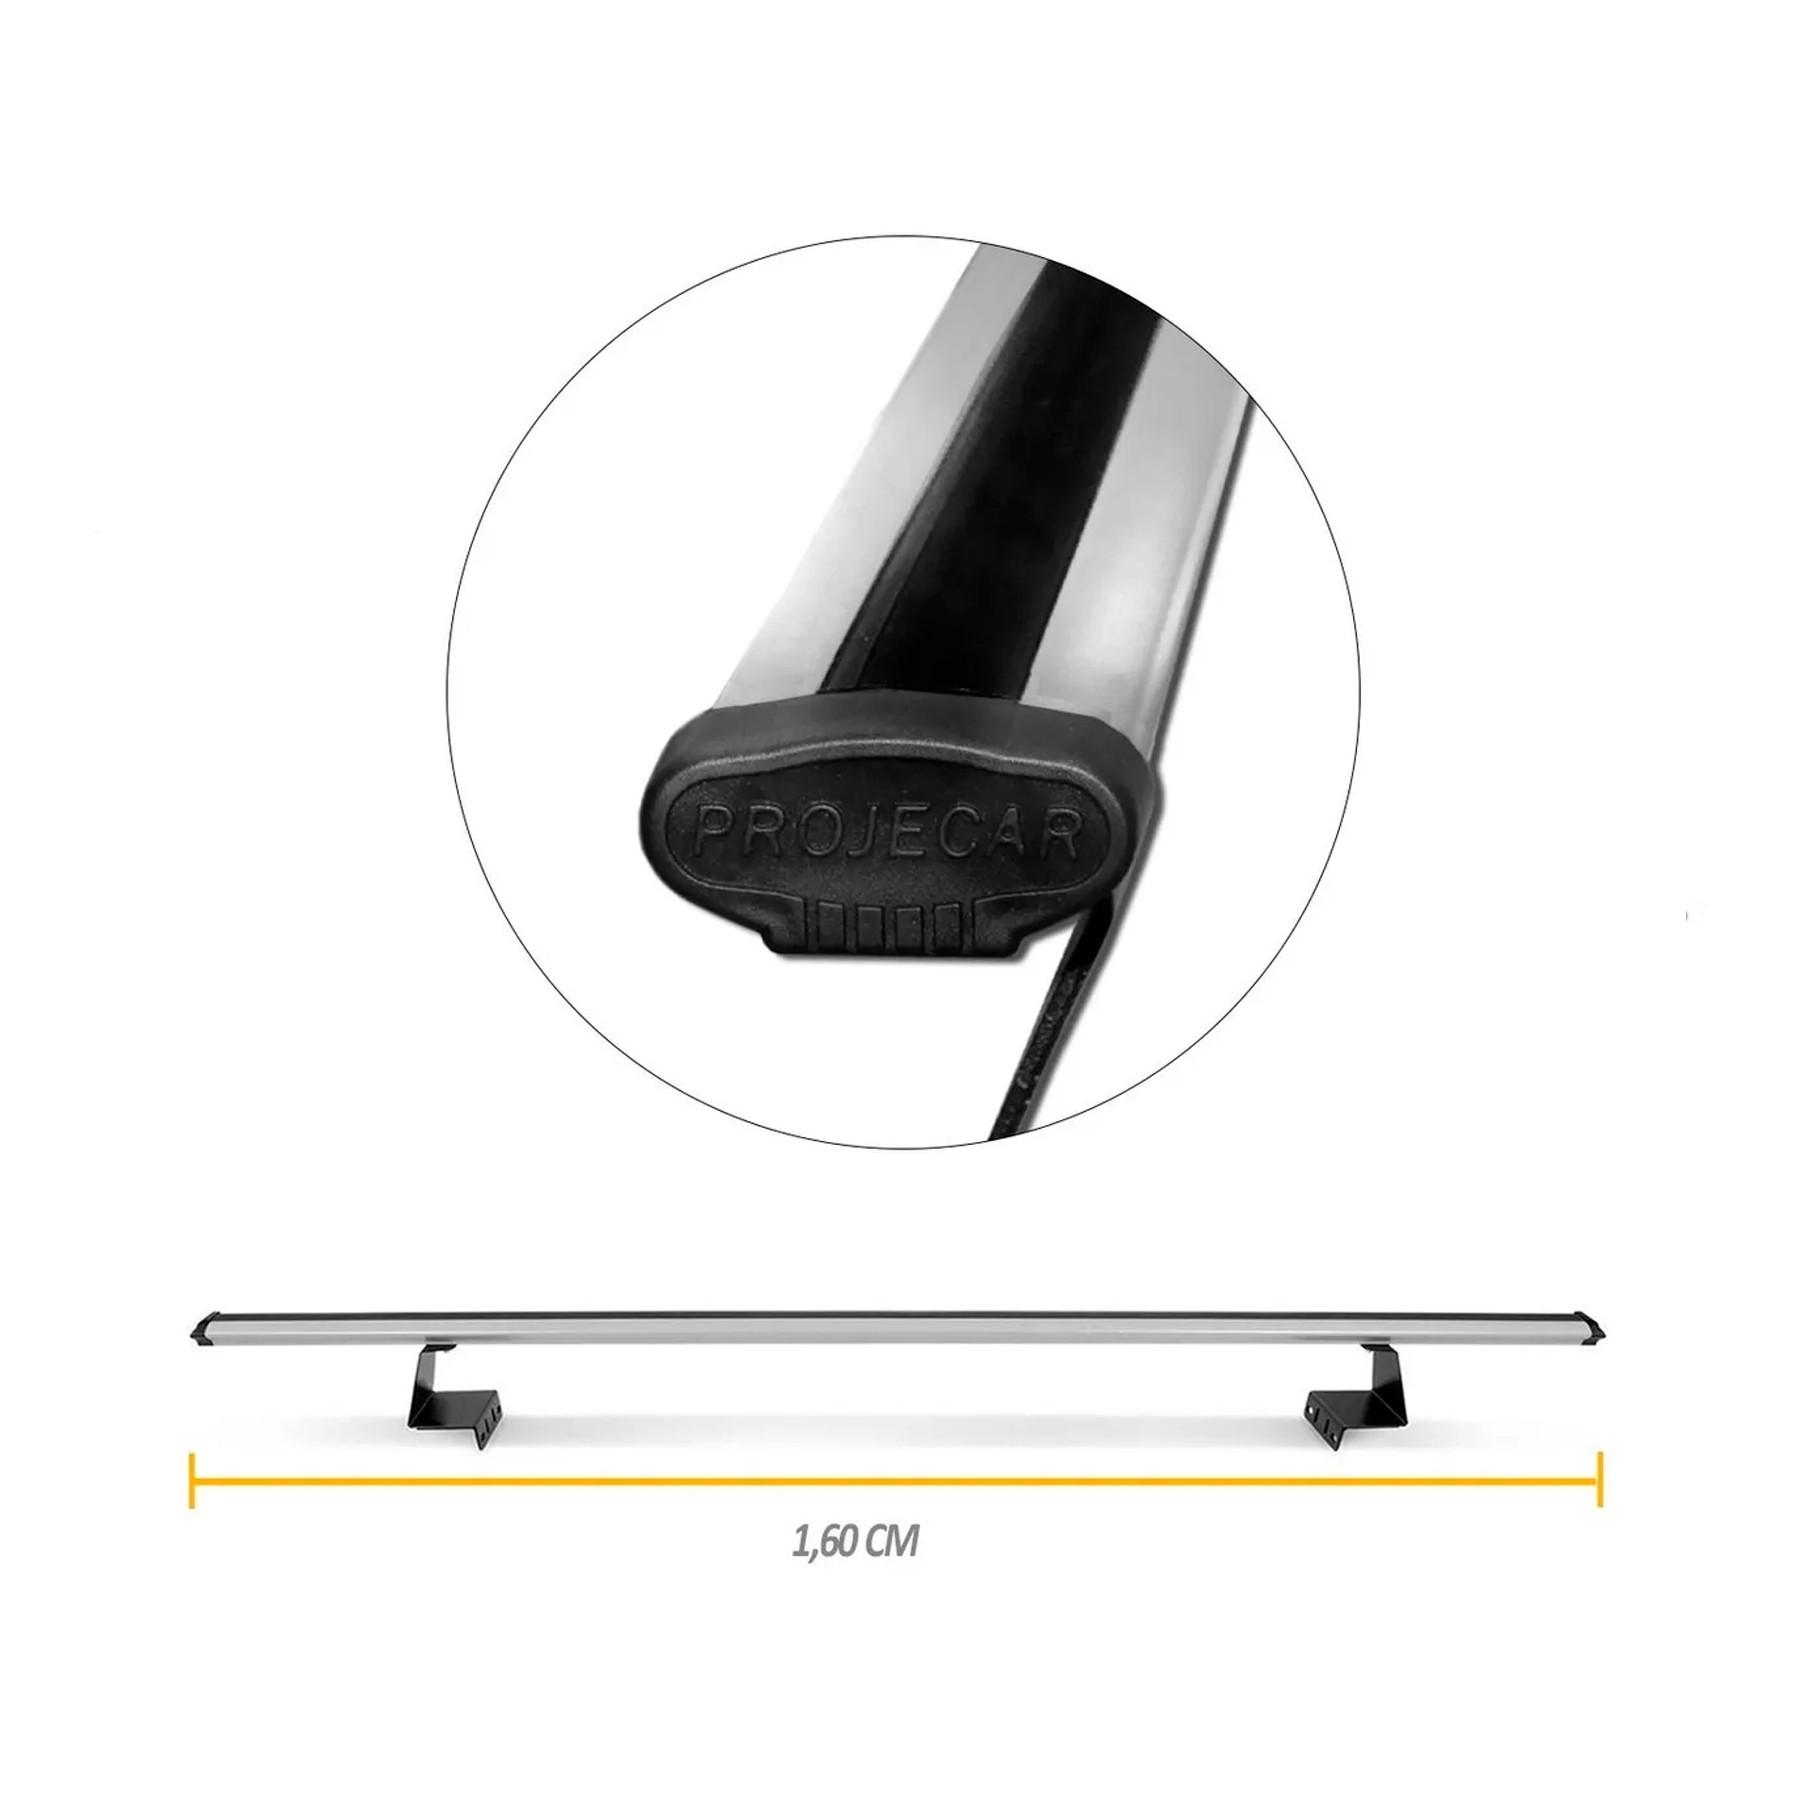 Rack Para Caçamba 1,60m Universal Aluminio Prata Anodizado Projecar